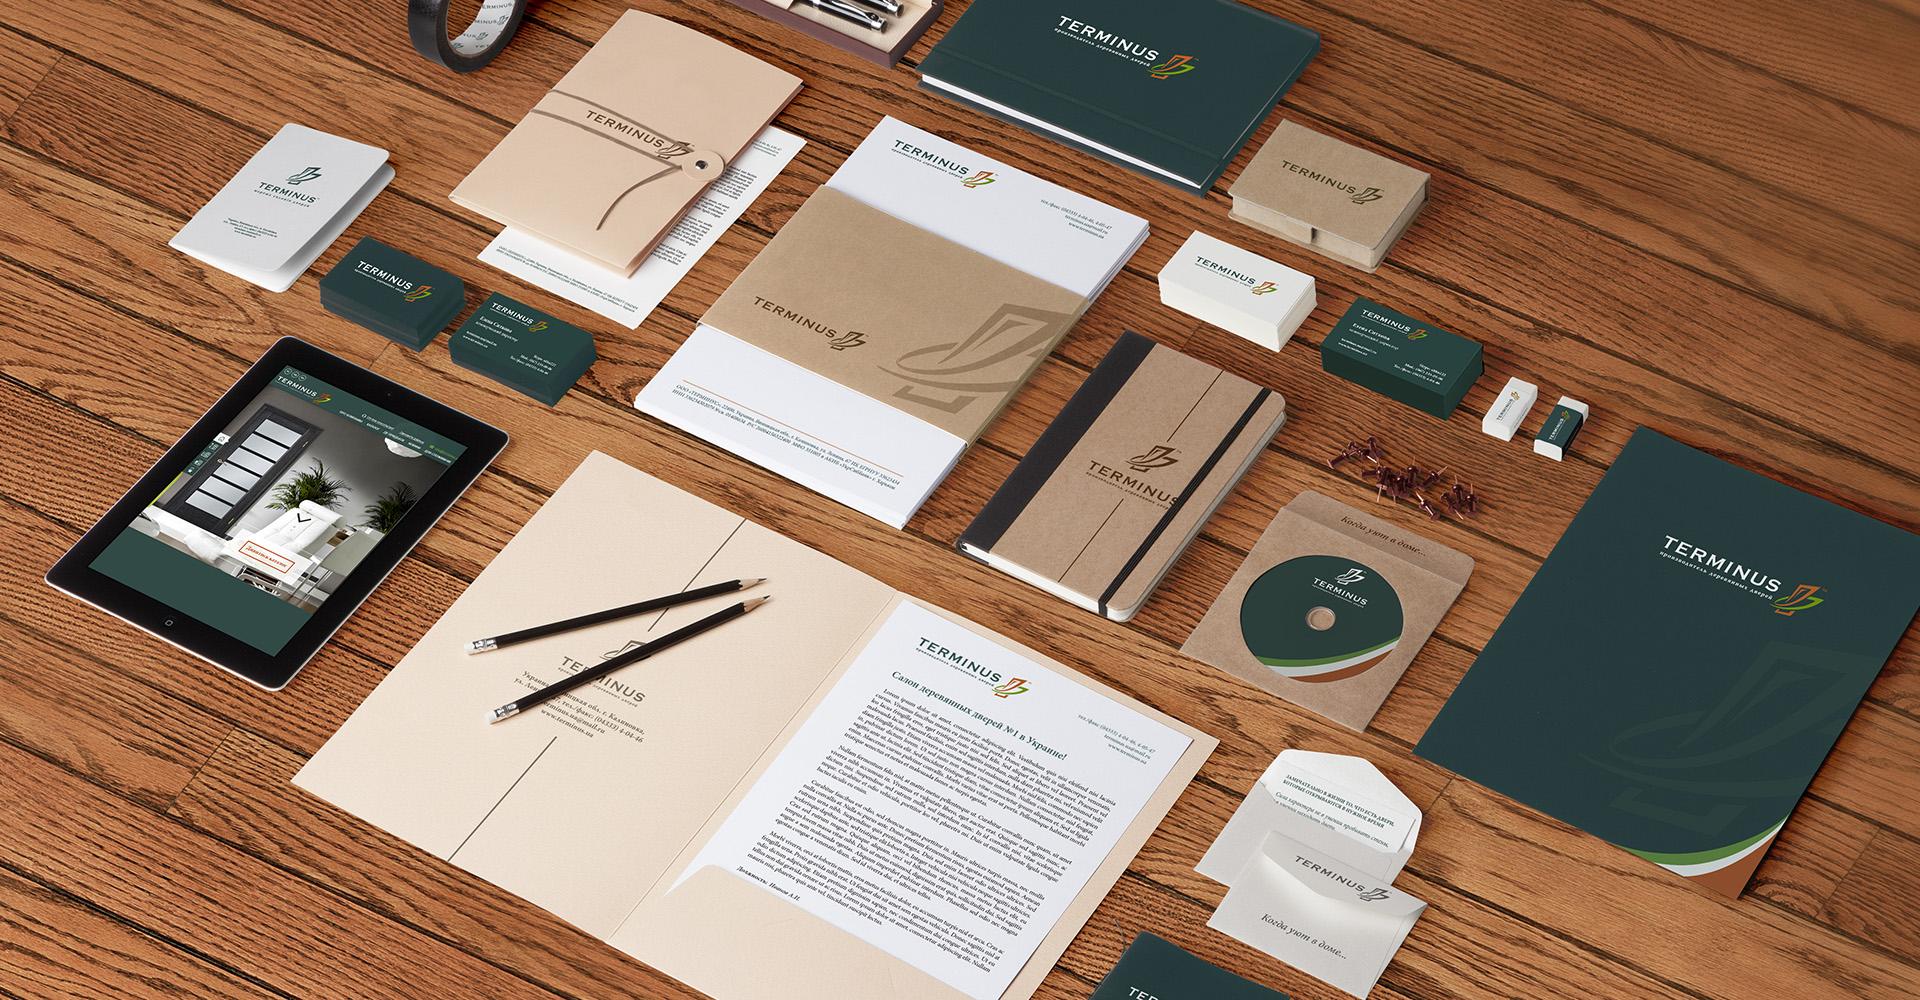 разработка брендбука для завода по производству дверей, The development of a brand book for a factory for the production of doors